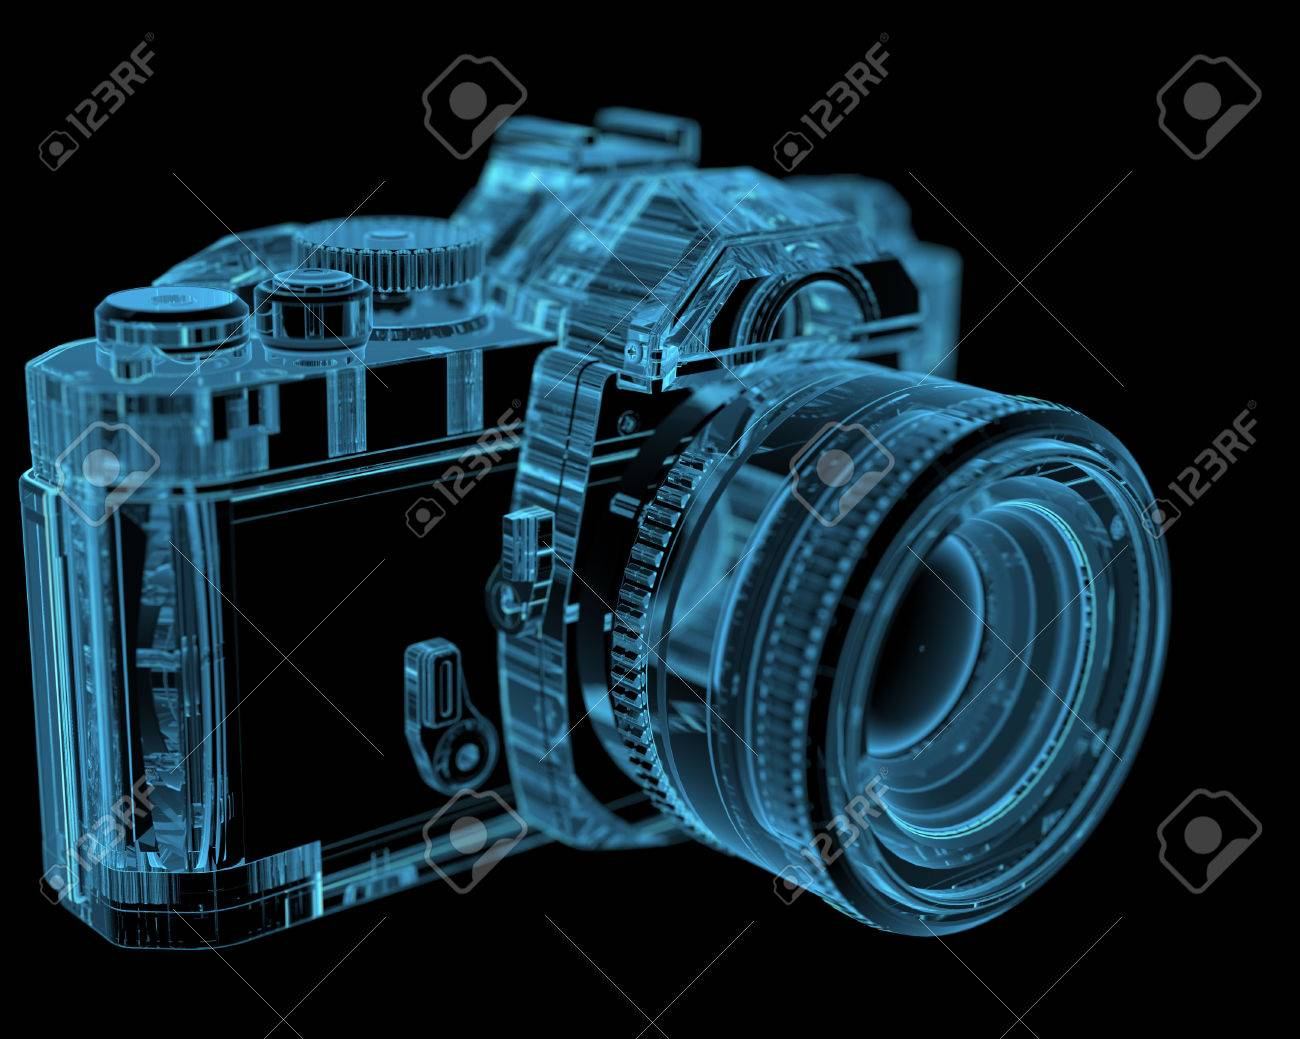 Camera 3d Dslr Camera dslr slr camera 3d xray blue transparent stock photo picture and 27466903